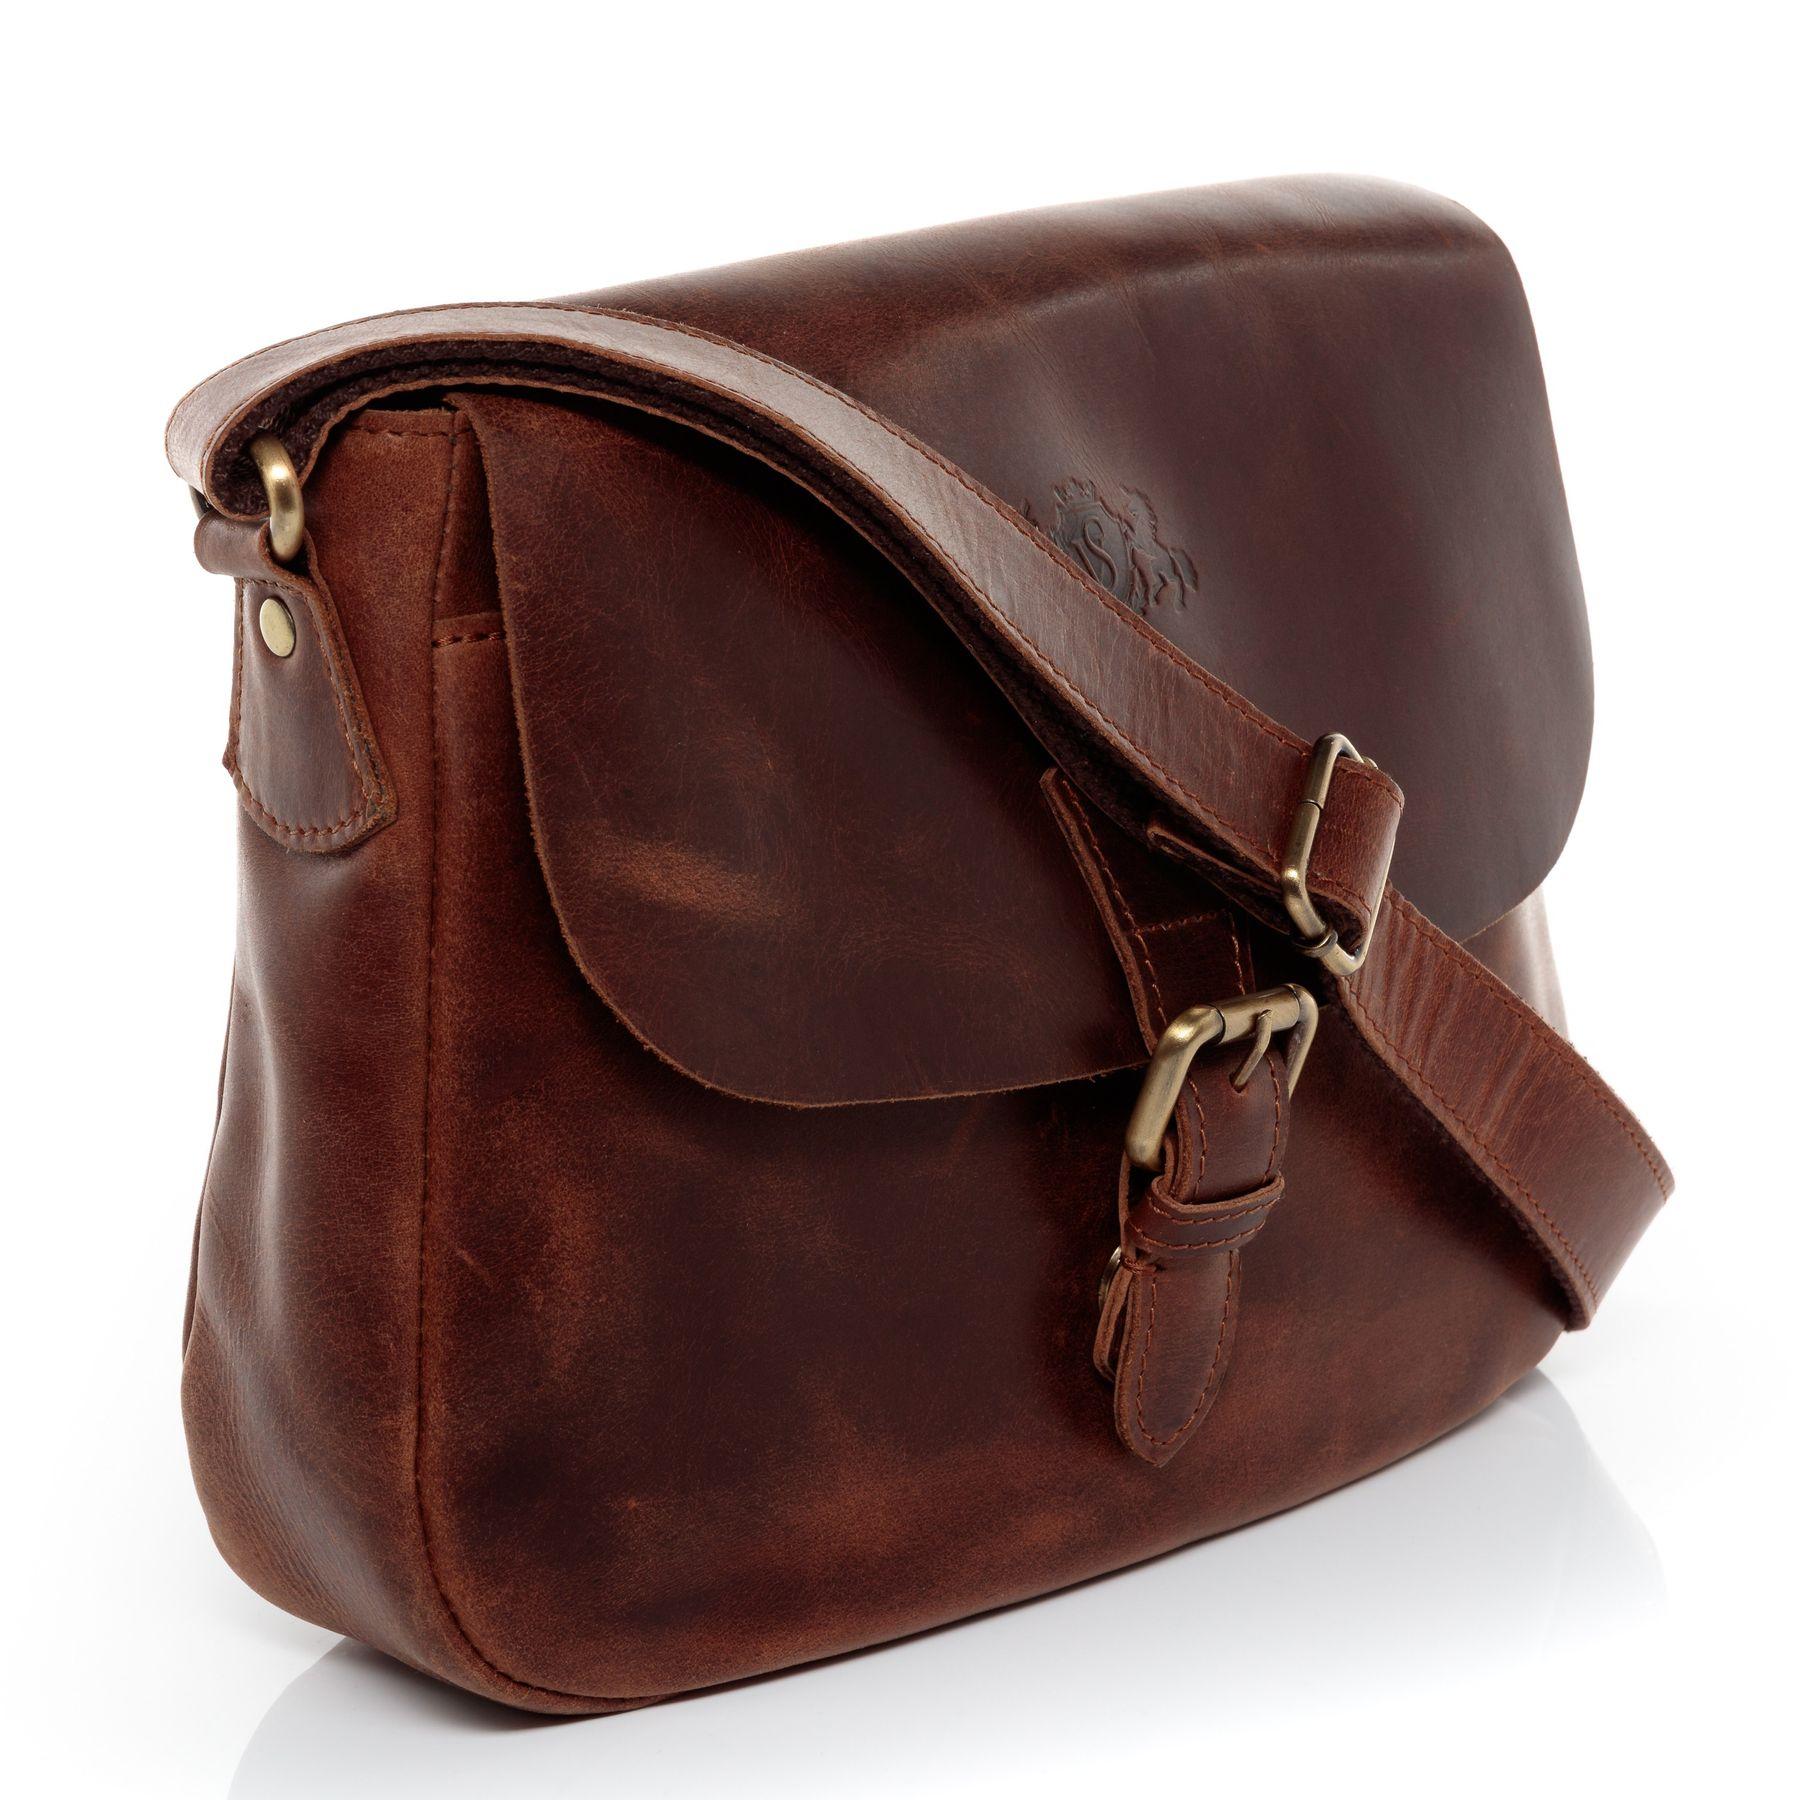 54571da5d0 SID & VAIN shoulder bag & cross-body bag Natural Leather ABERDEEN ...